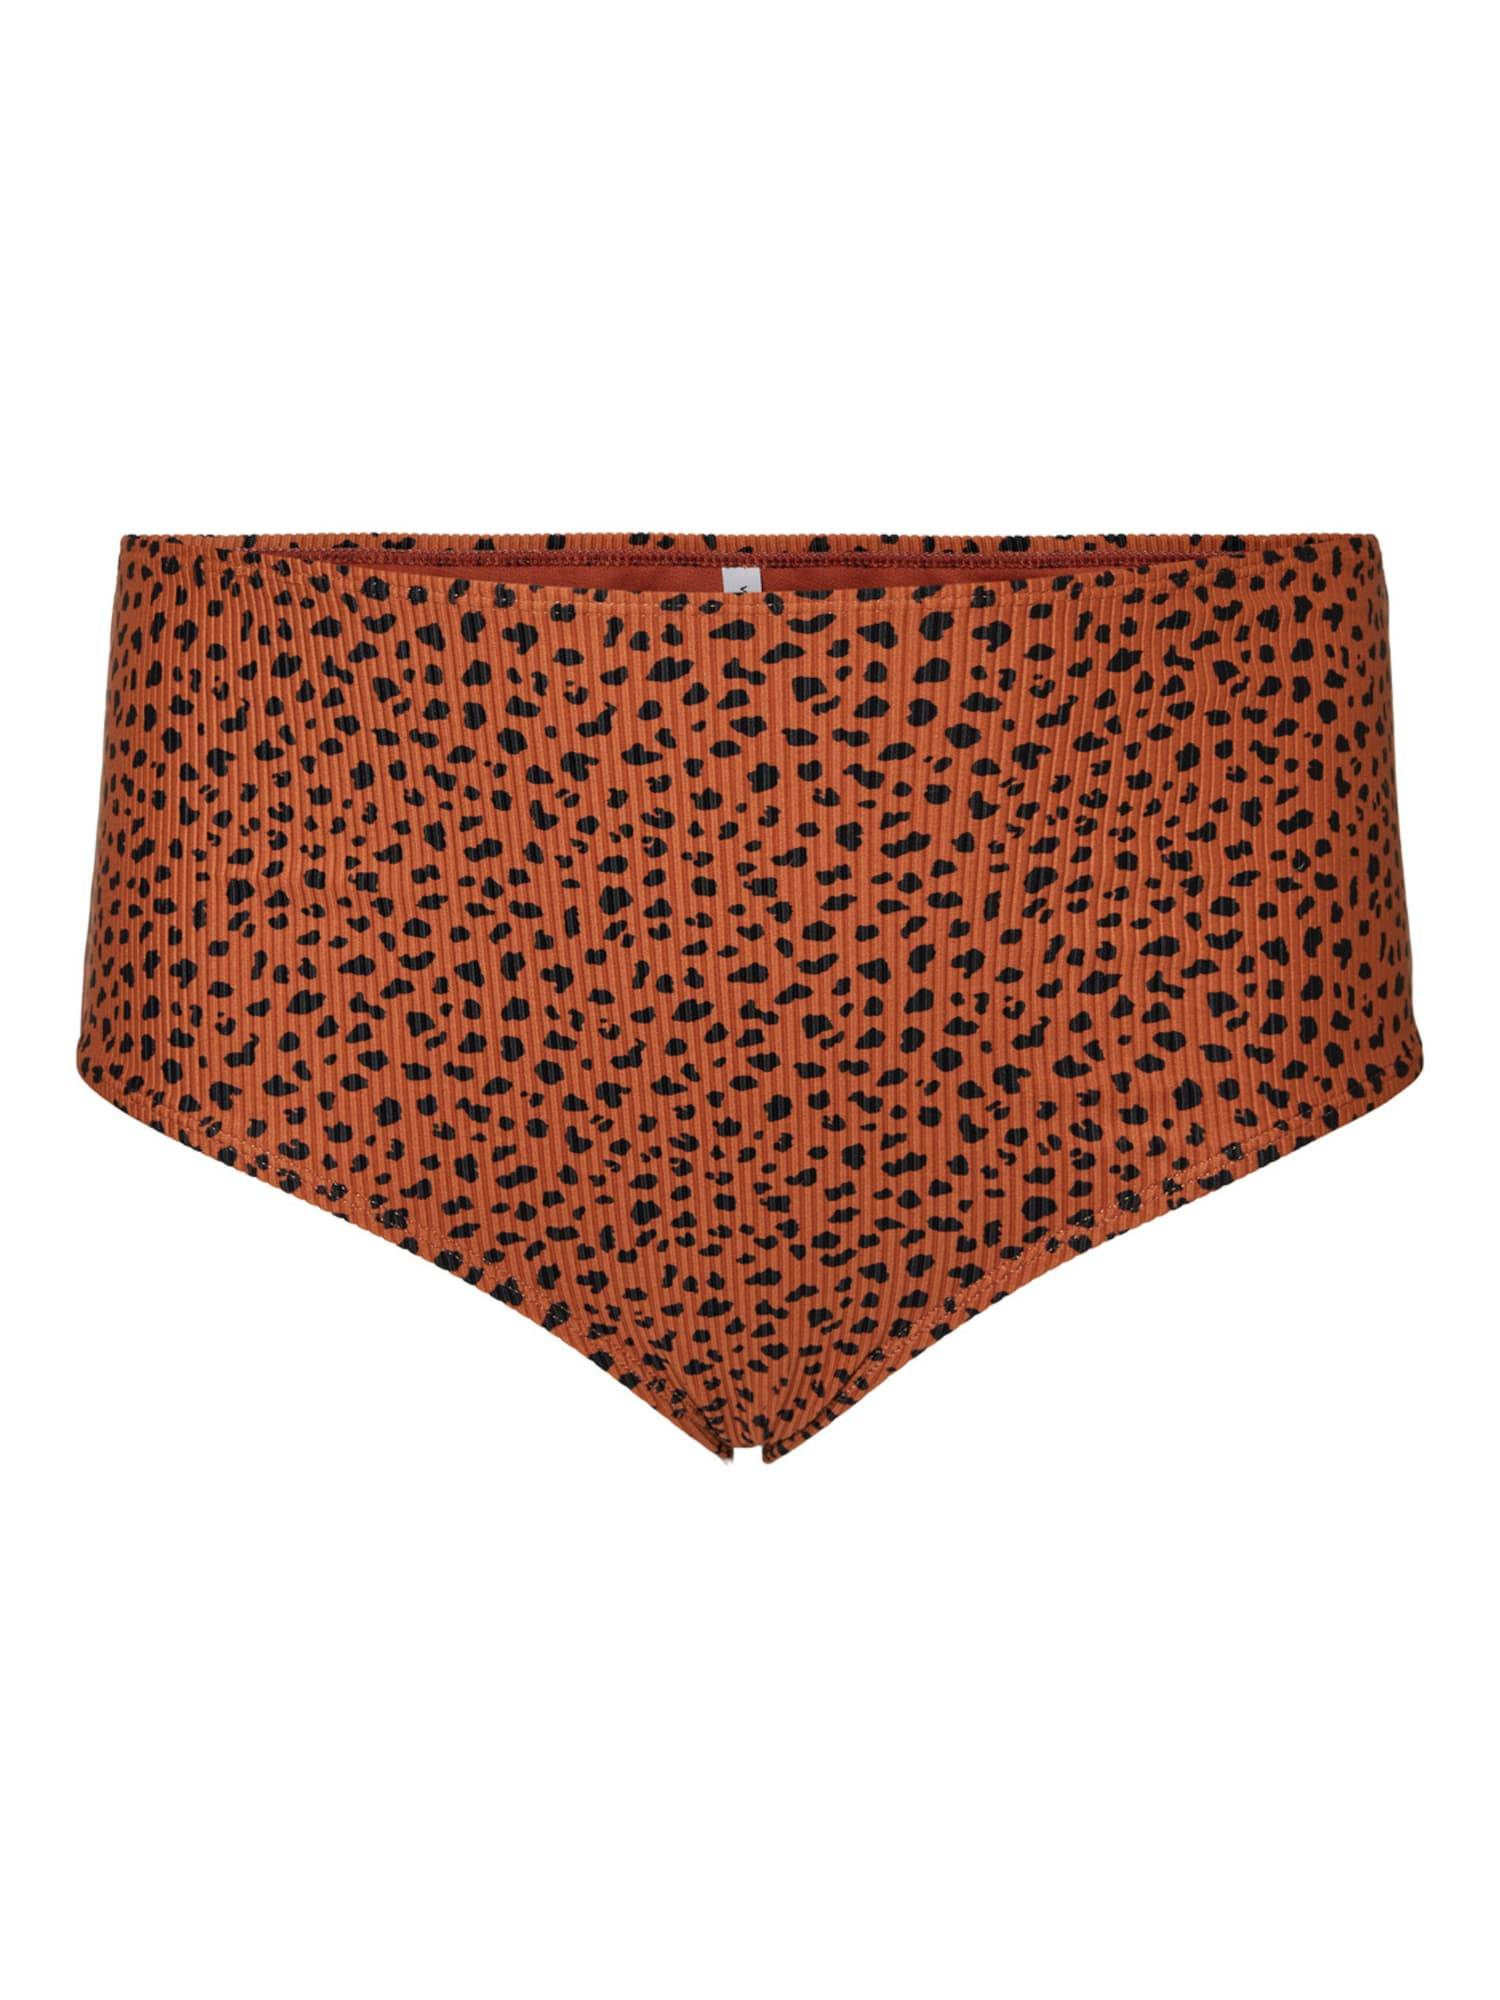 Vero Moda Curve Bas de bikini 'Madison'  - Marron - Taille: 48 - female